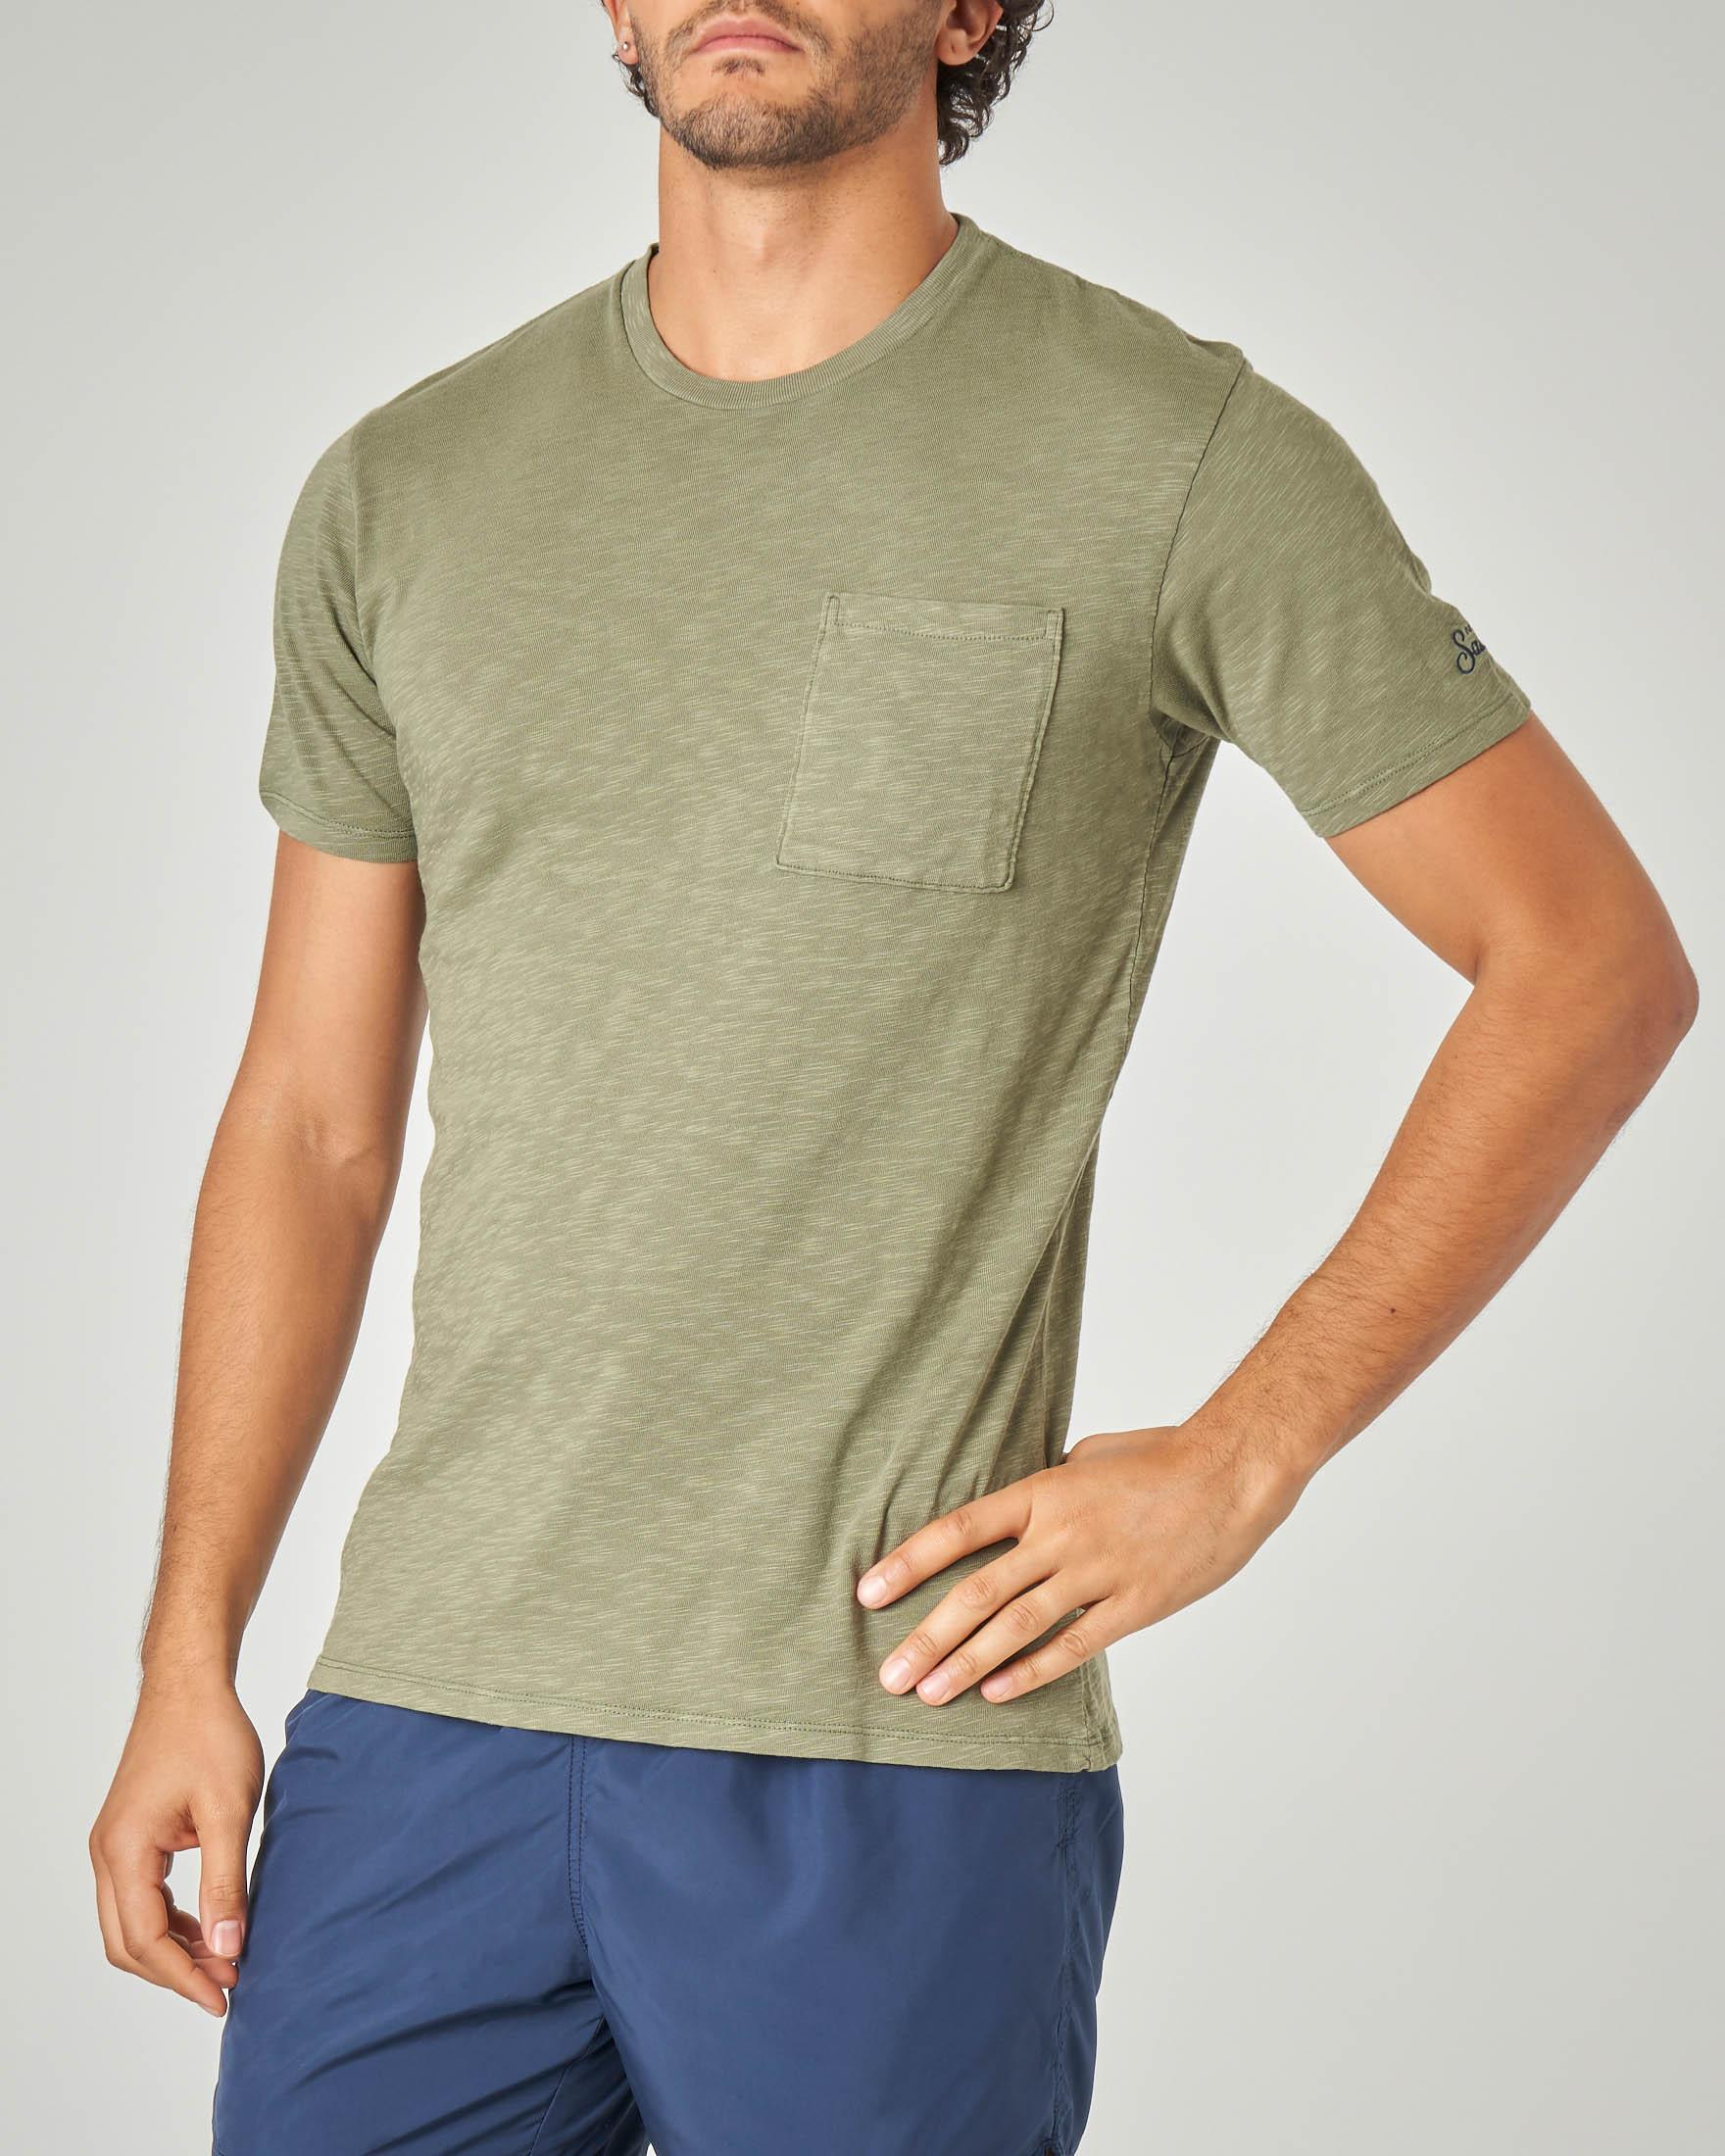 T-shirt verde militare con taschino